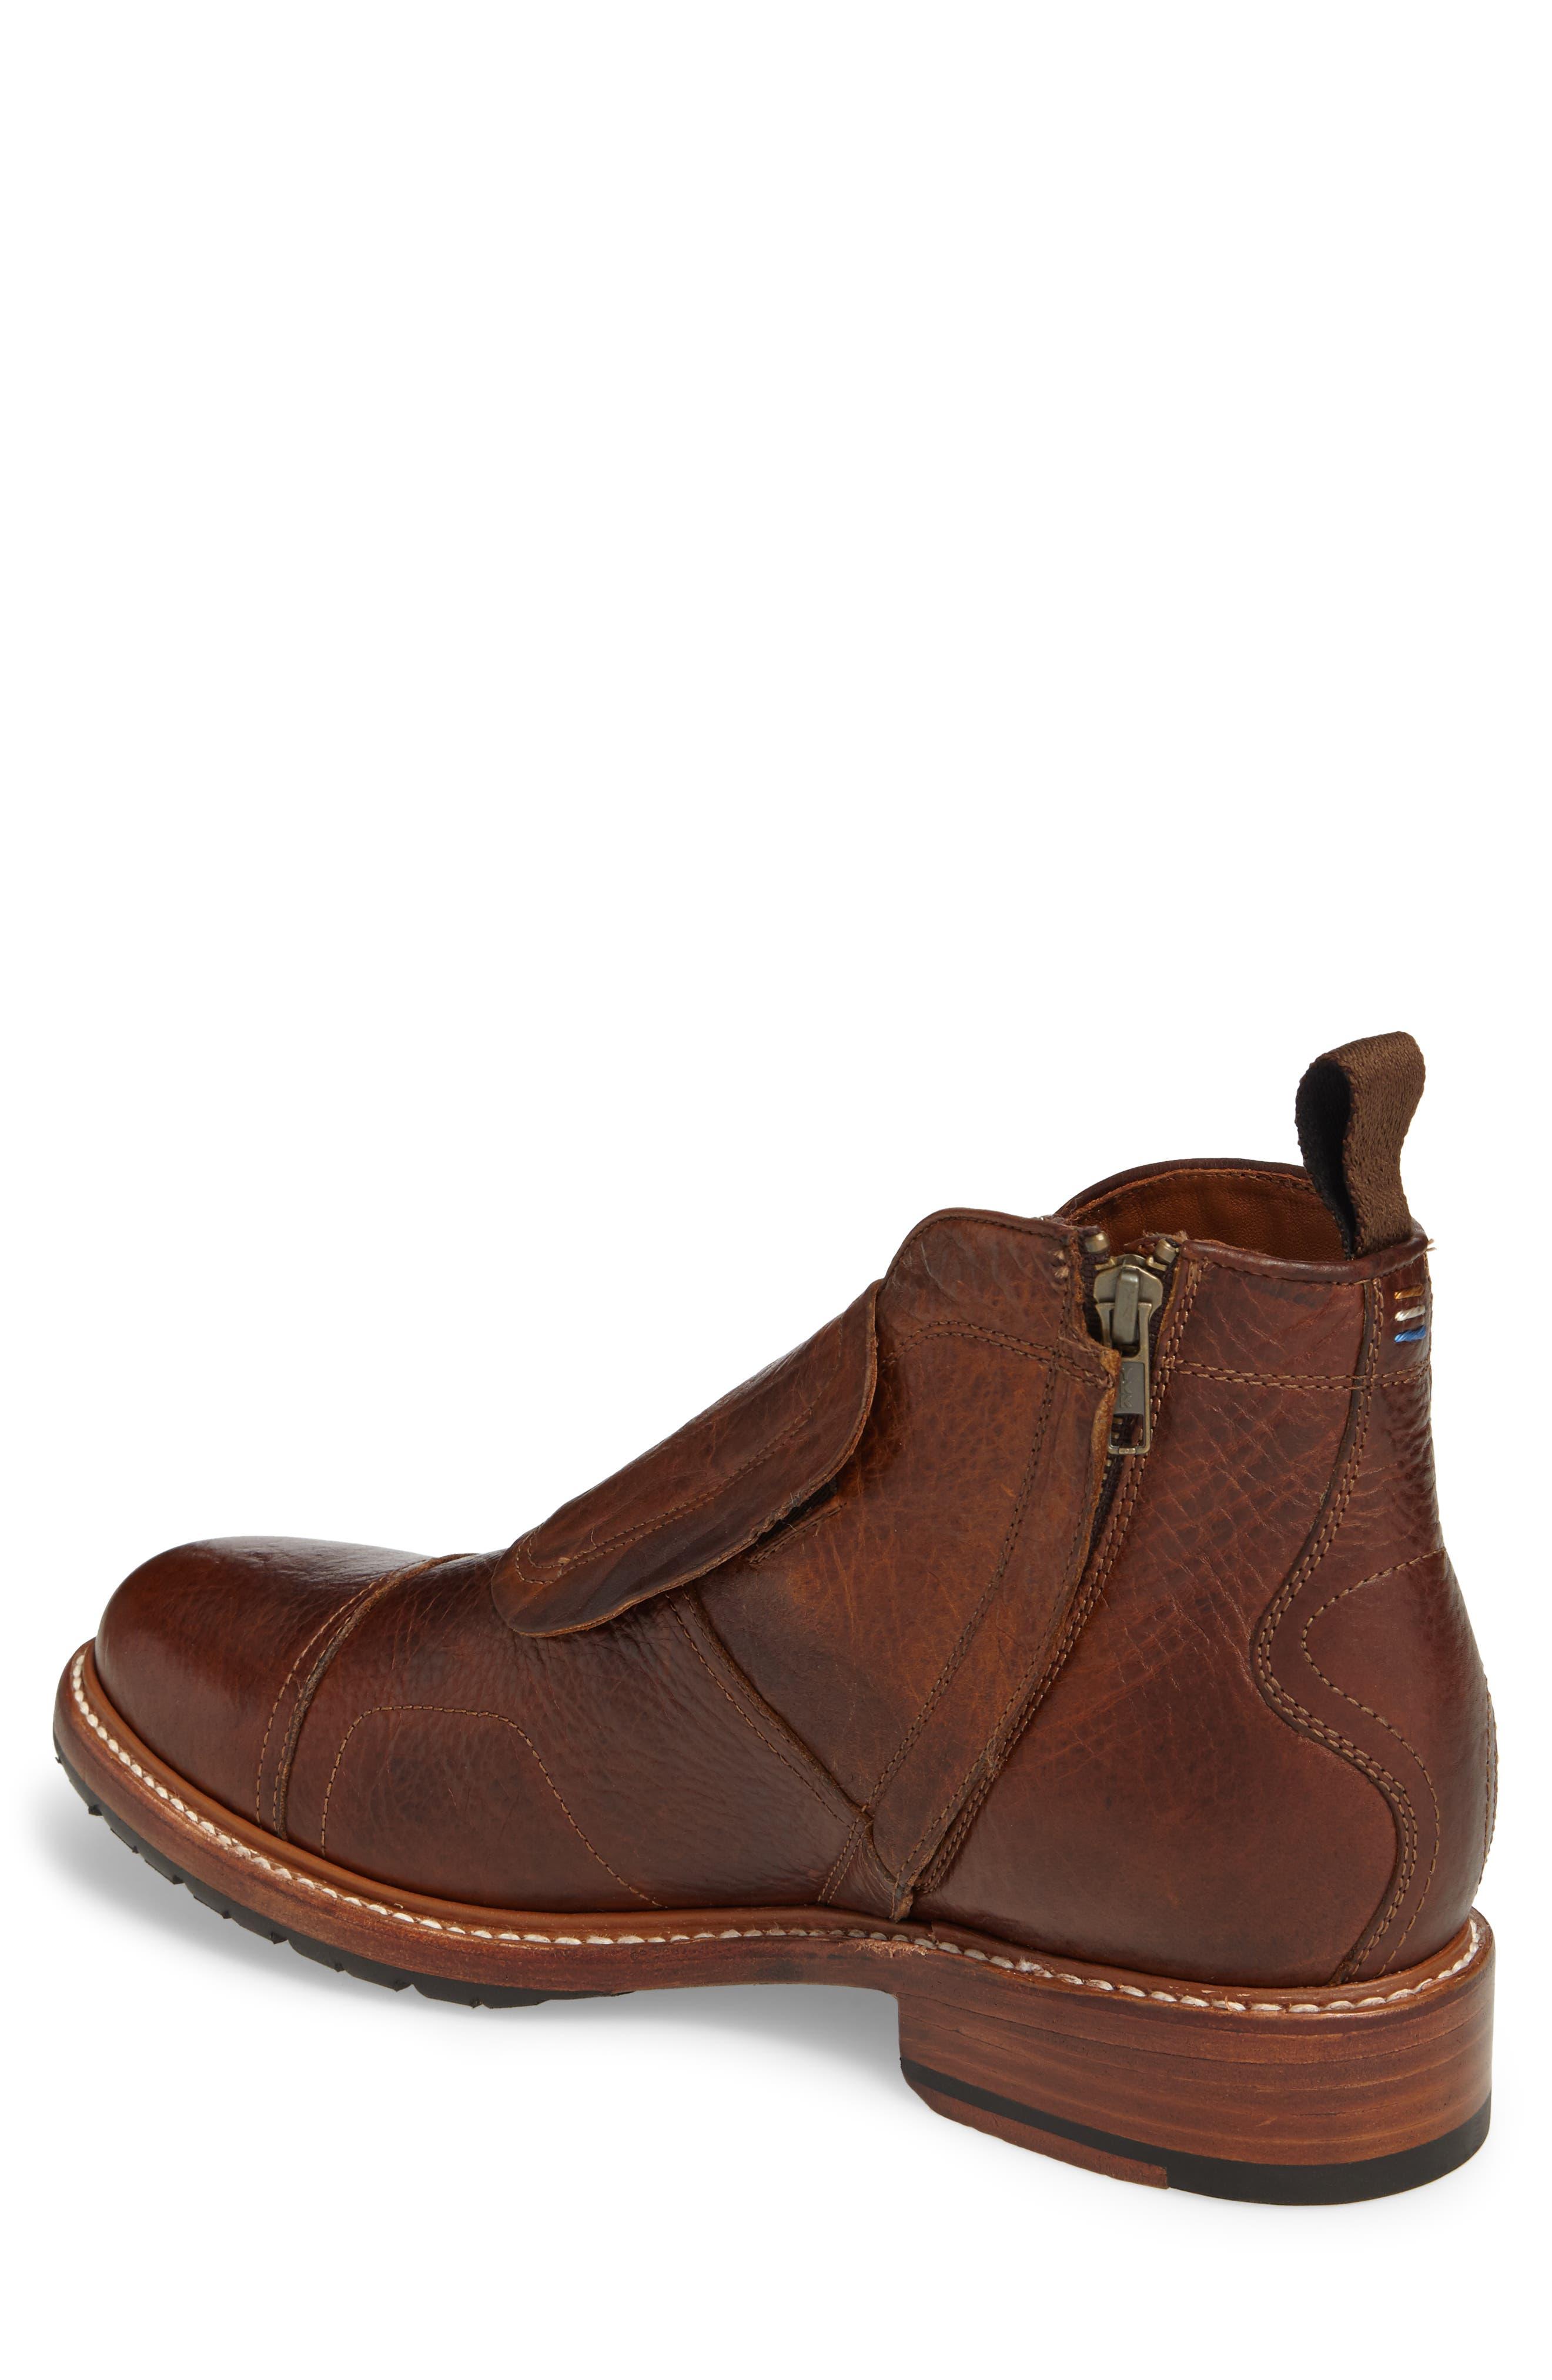 Montclair Zip Boot,                             Alternate thumbnail 2, color,                             Brown Leather